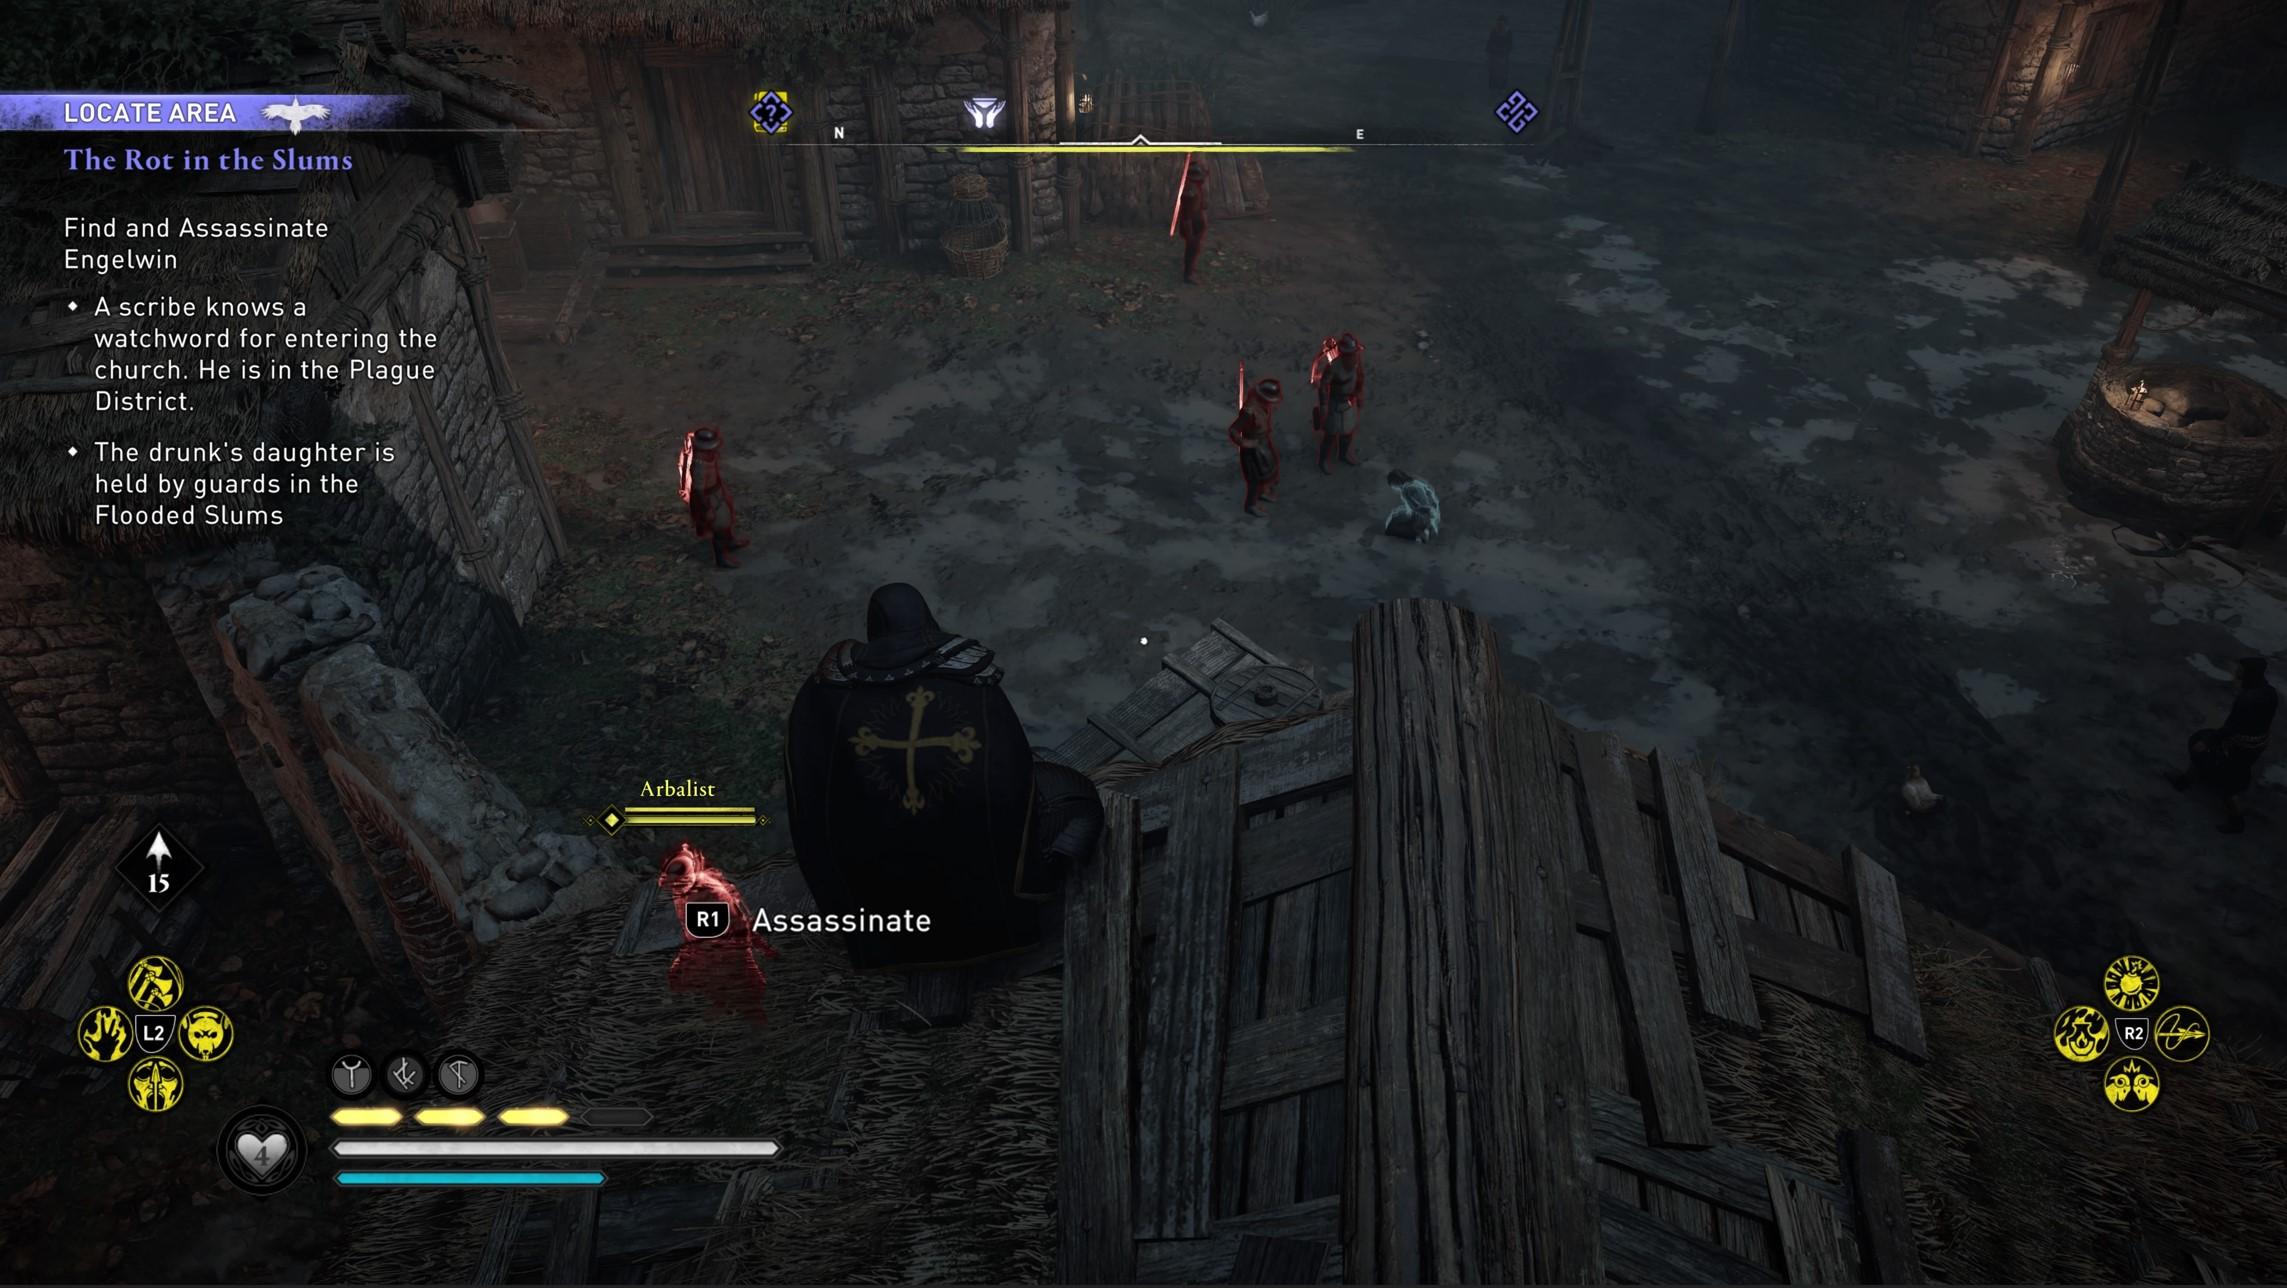 assassins creed valhalla siege of paris infiltration black box mission Assassin's Creed Valhalla Siege of Paris DLC review